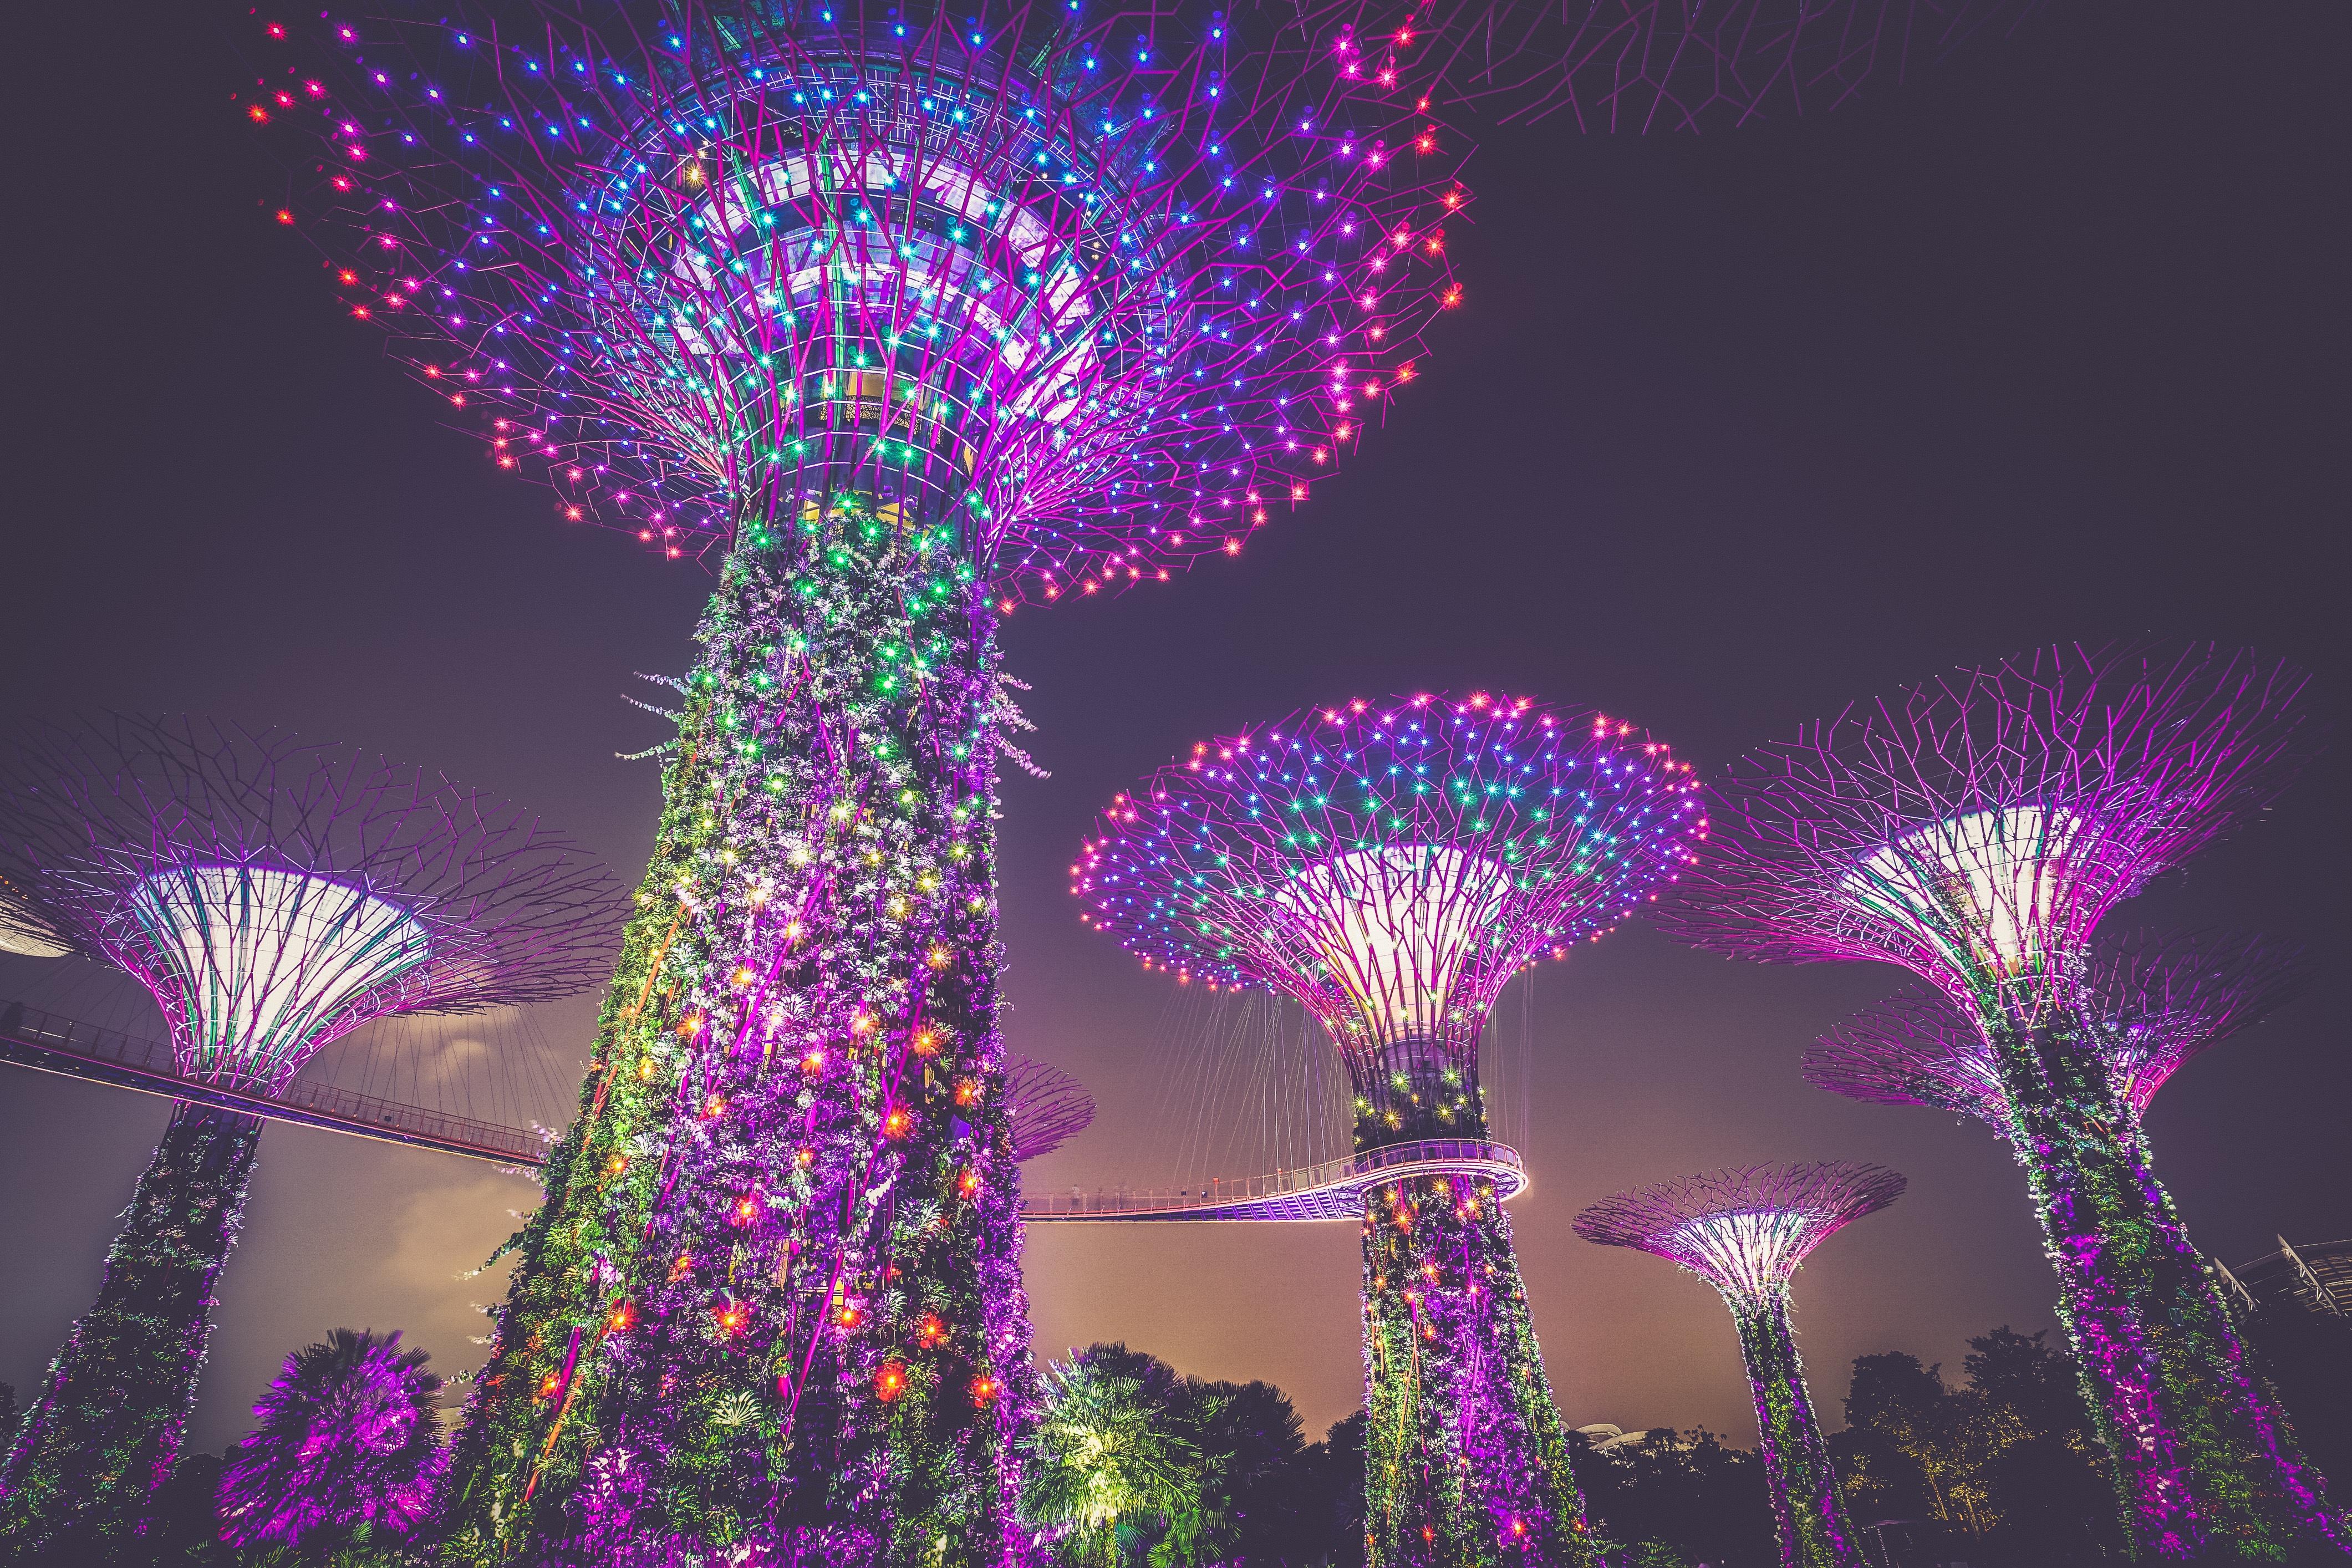 Free Images : tree, light, night, flower, walkway, christmas ...